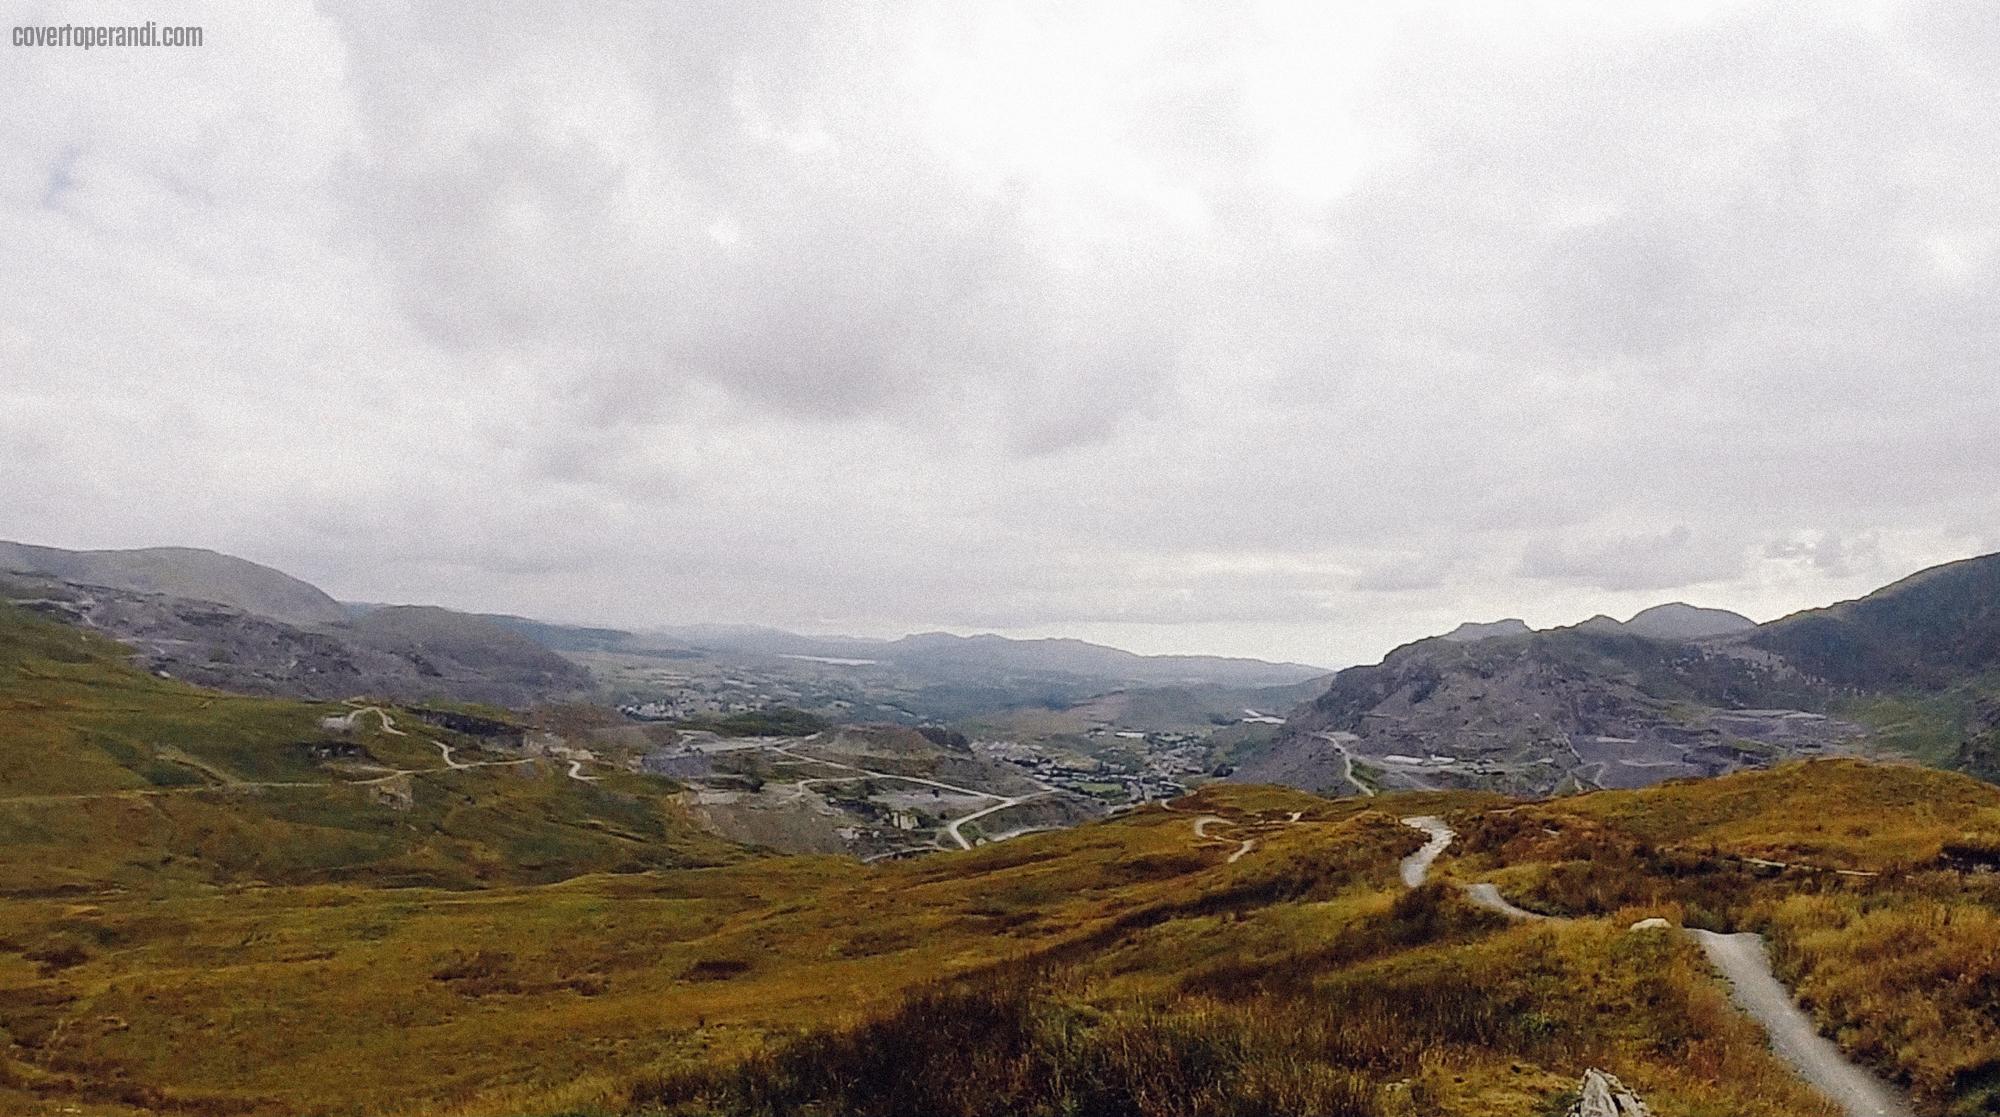 Covert Operandi - 2014 Wales-28.jpg